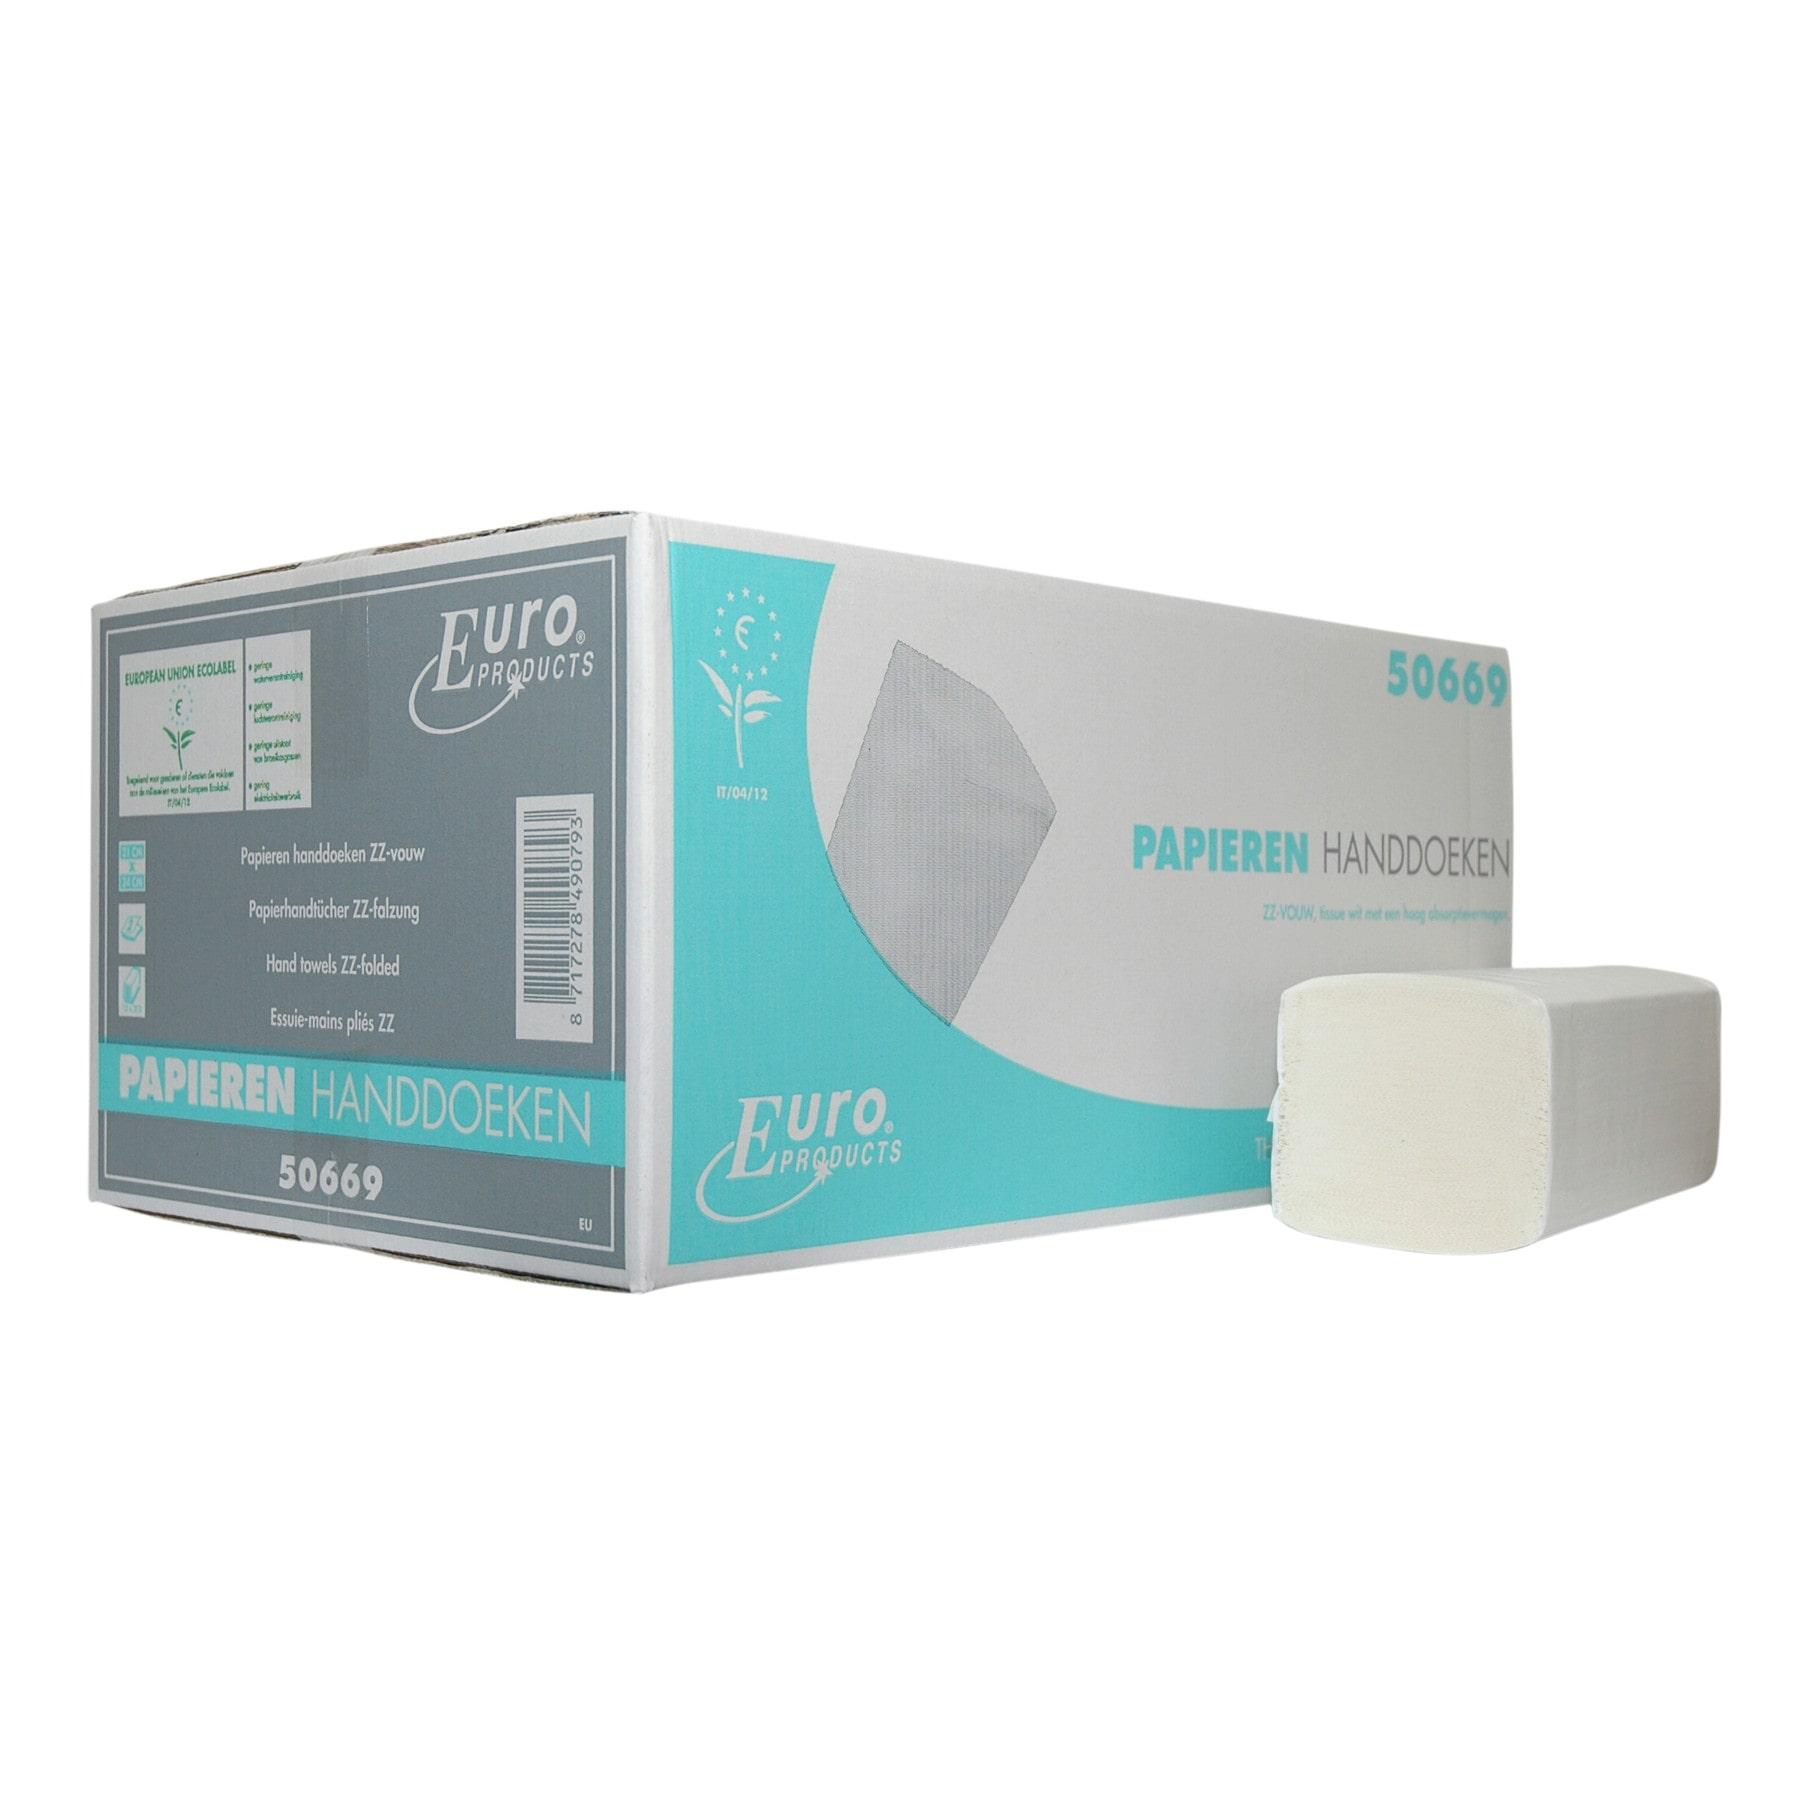 Euro Products | Z- vouwhanddoekjes | 2-laags tissue | 21 x 24 cm | 20 x 160 stuks